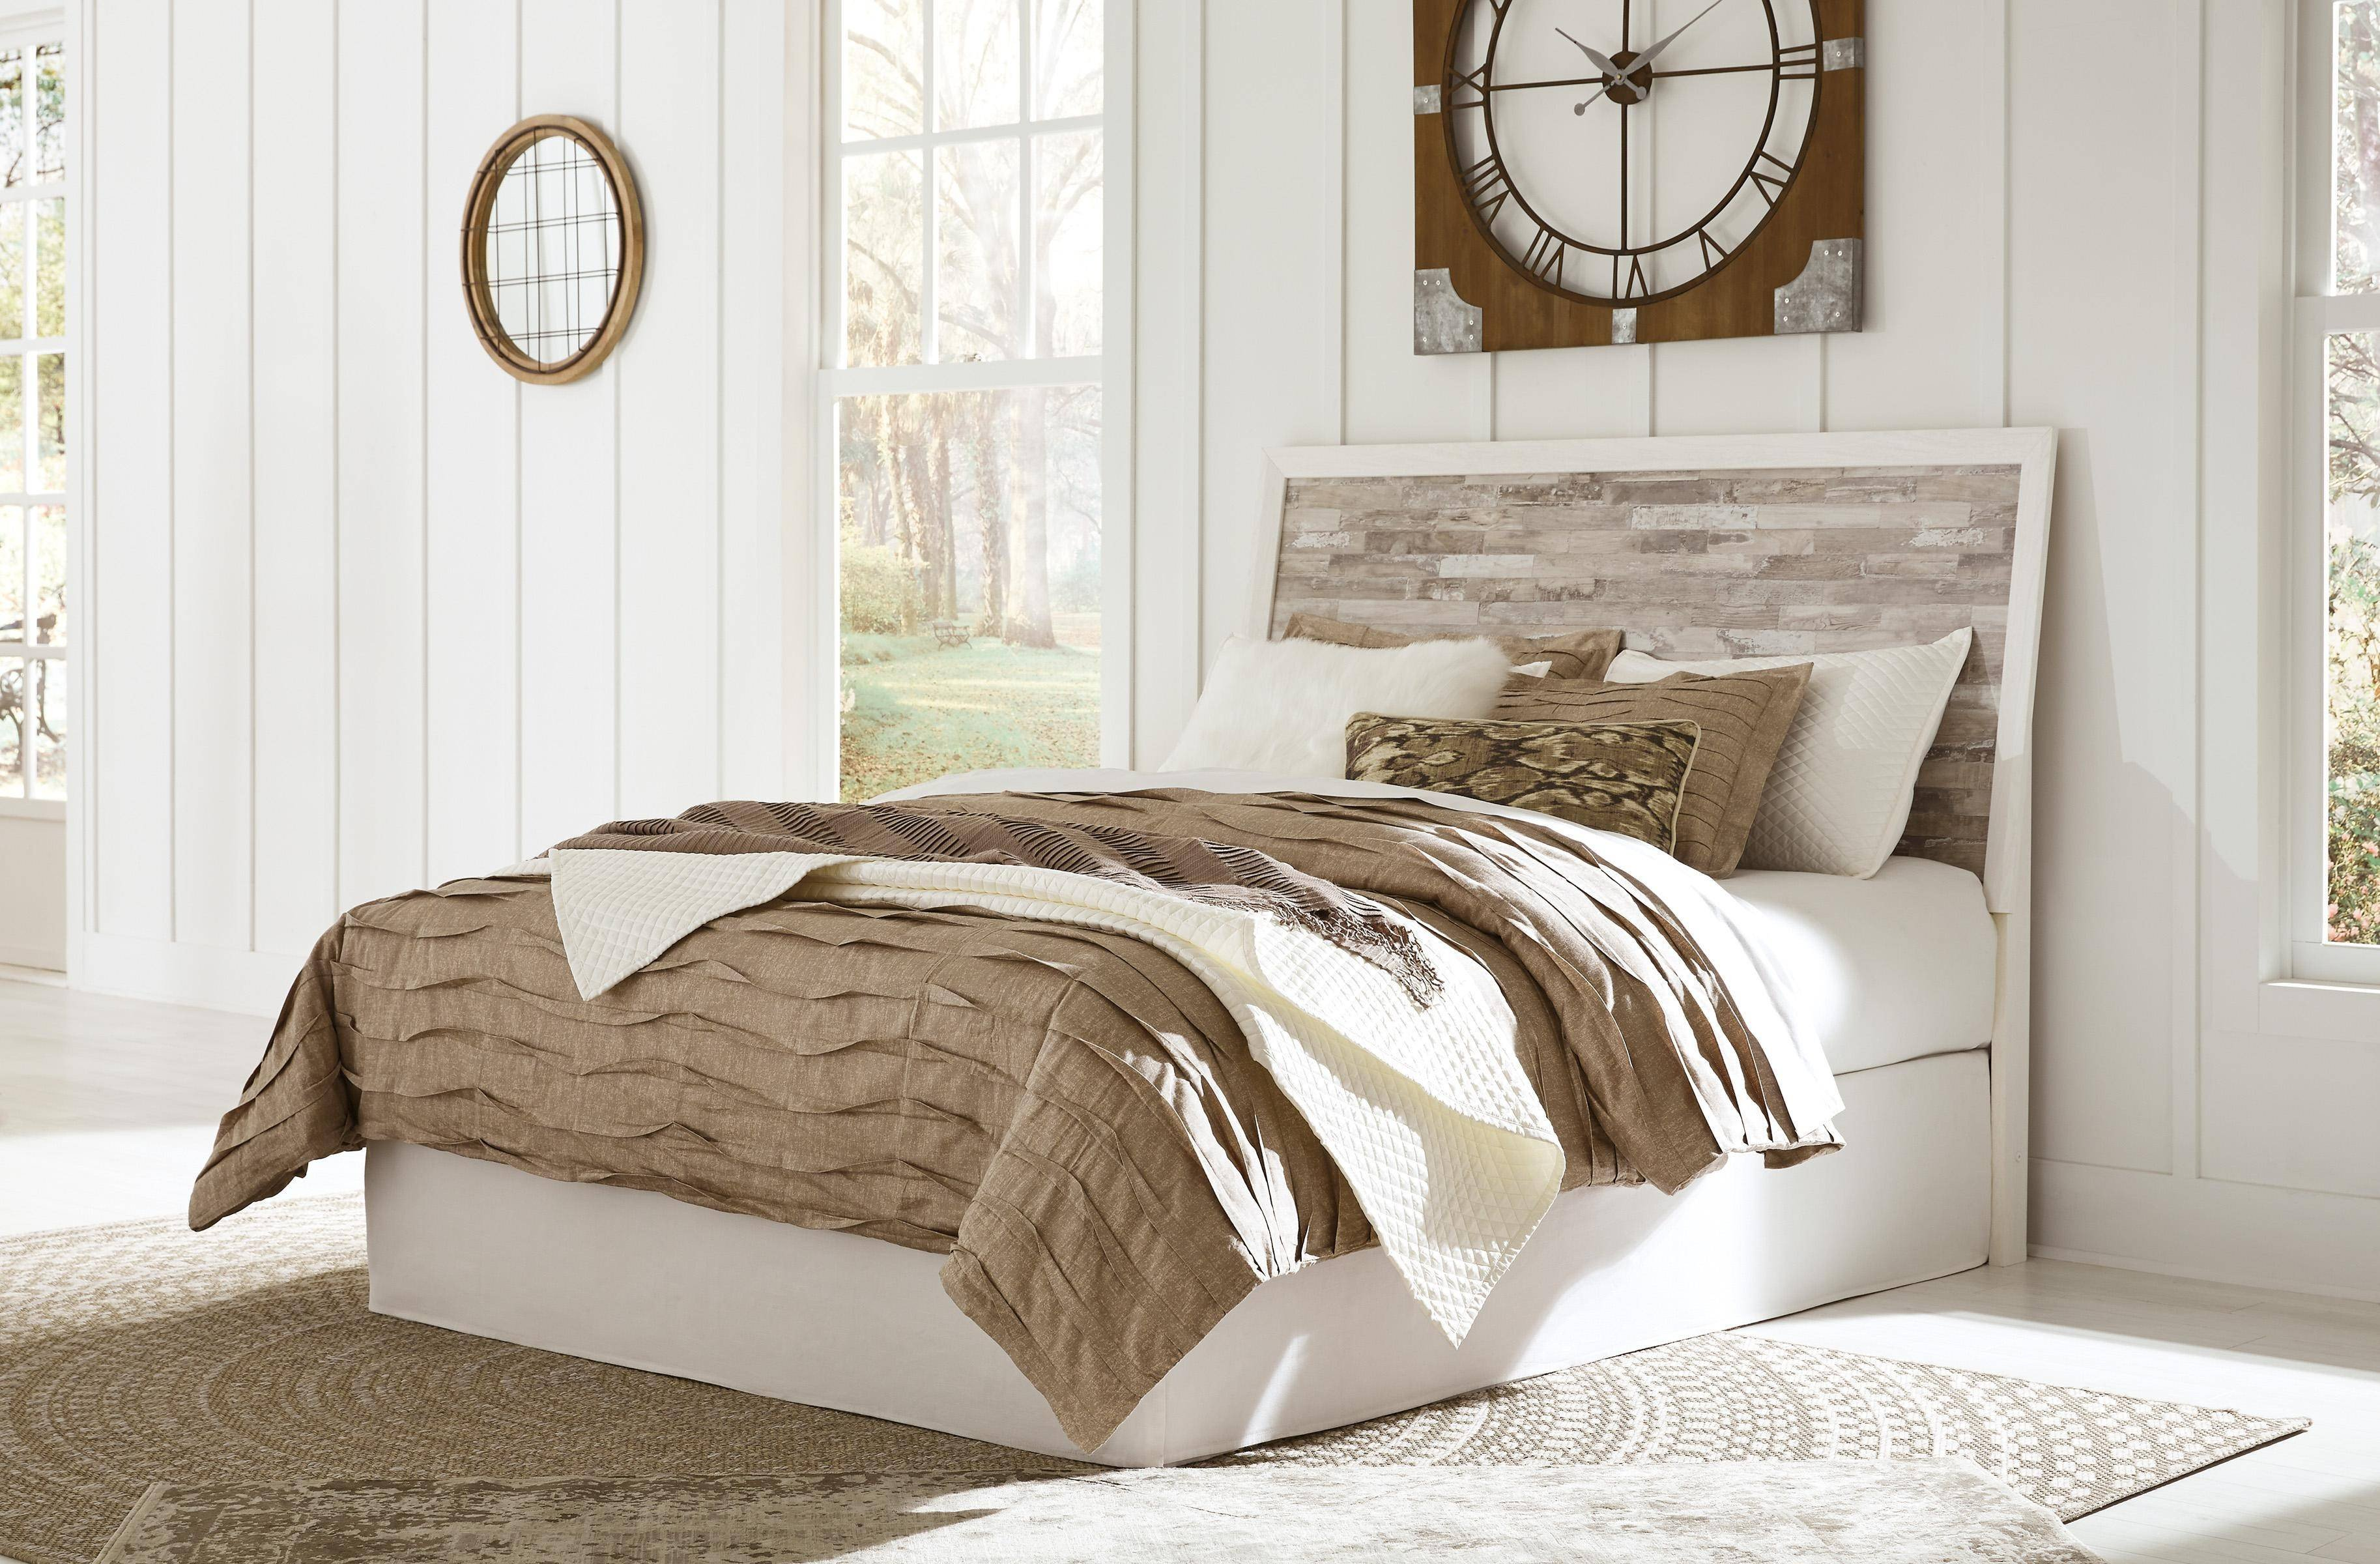 Cheap Queen Bedroom Set New ashley Evanni B315 Queen Size Platform Bedroom Set 6pcs In